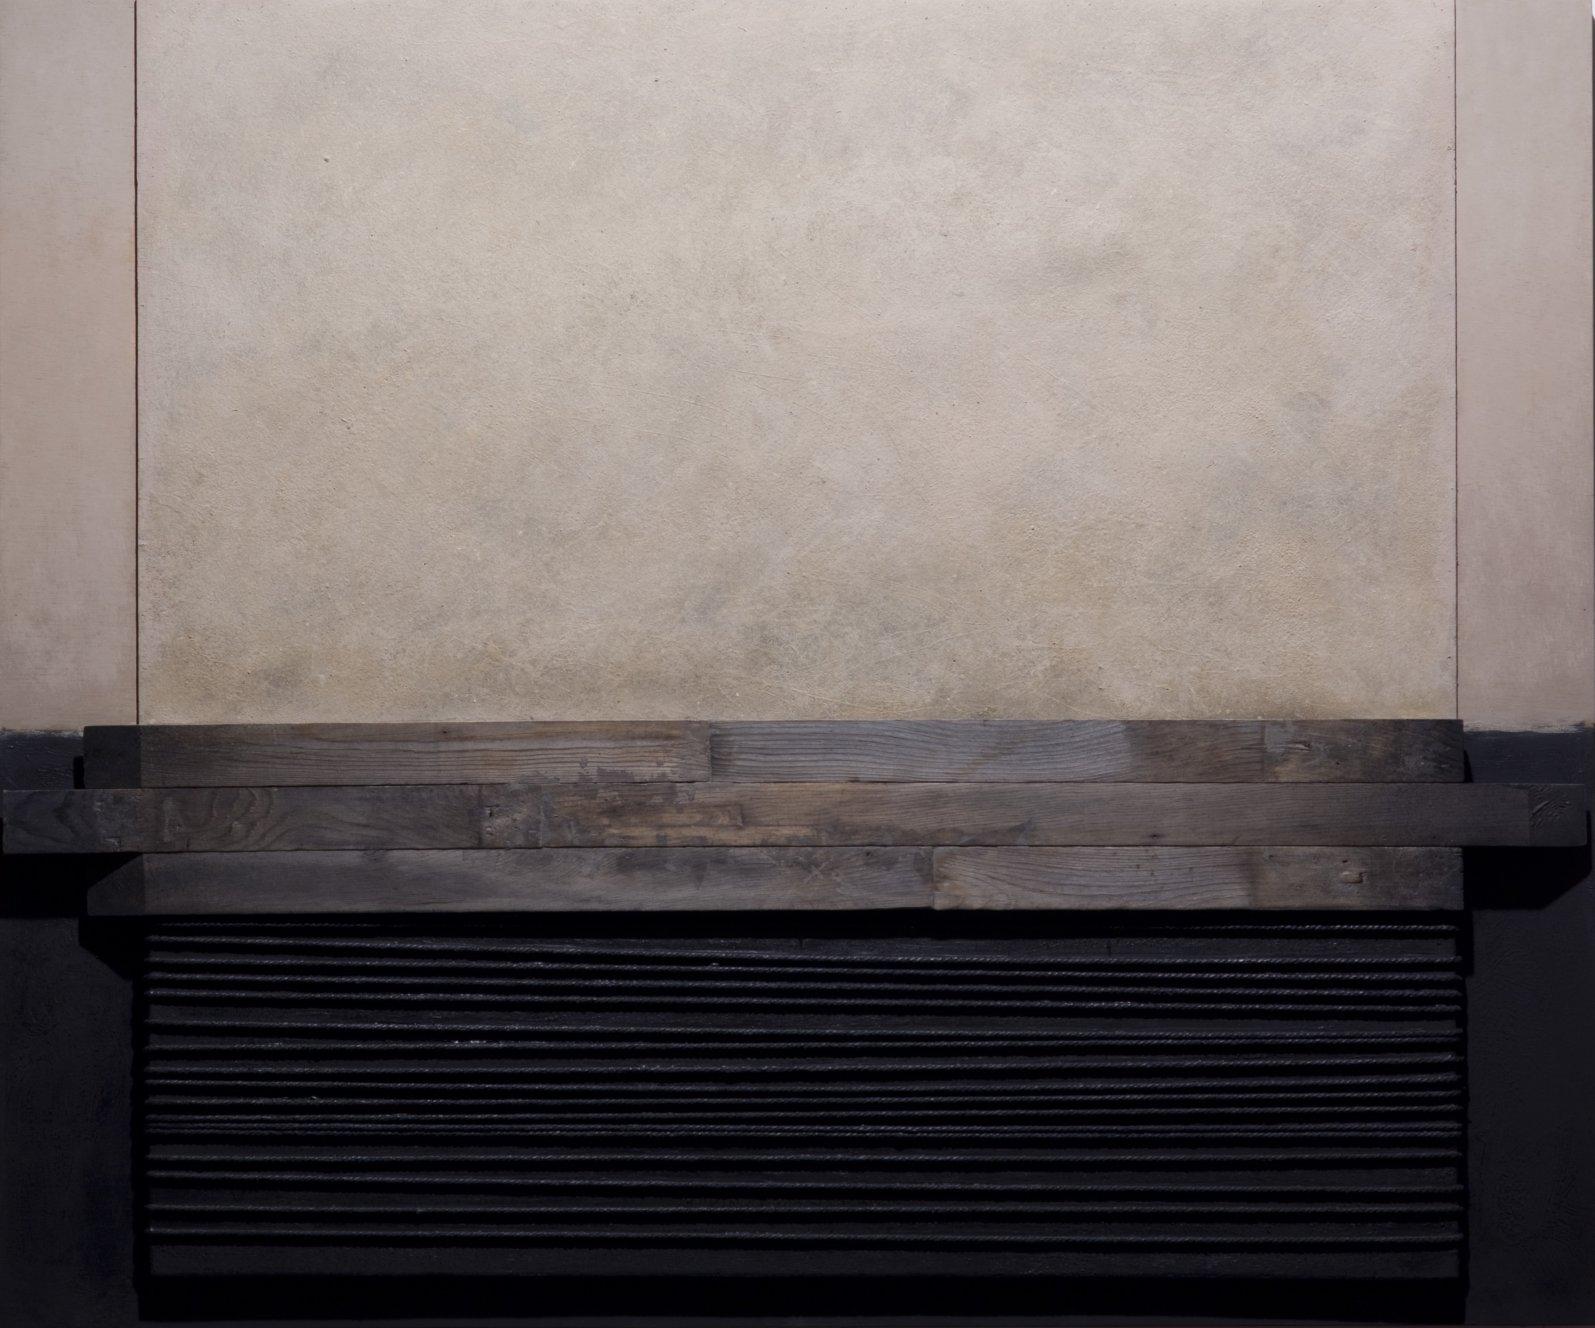 913 A. (2010) - Francisco Farreras Ricart